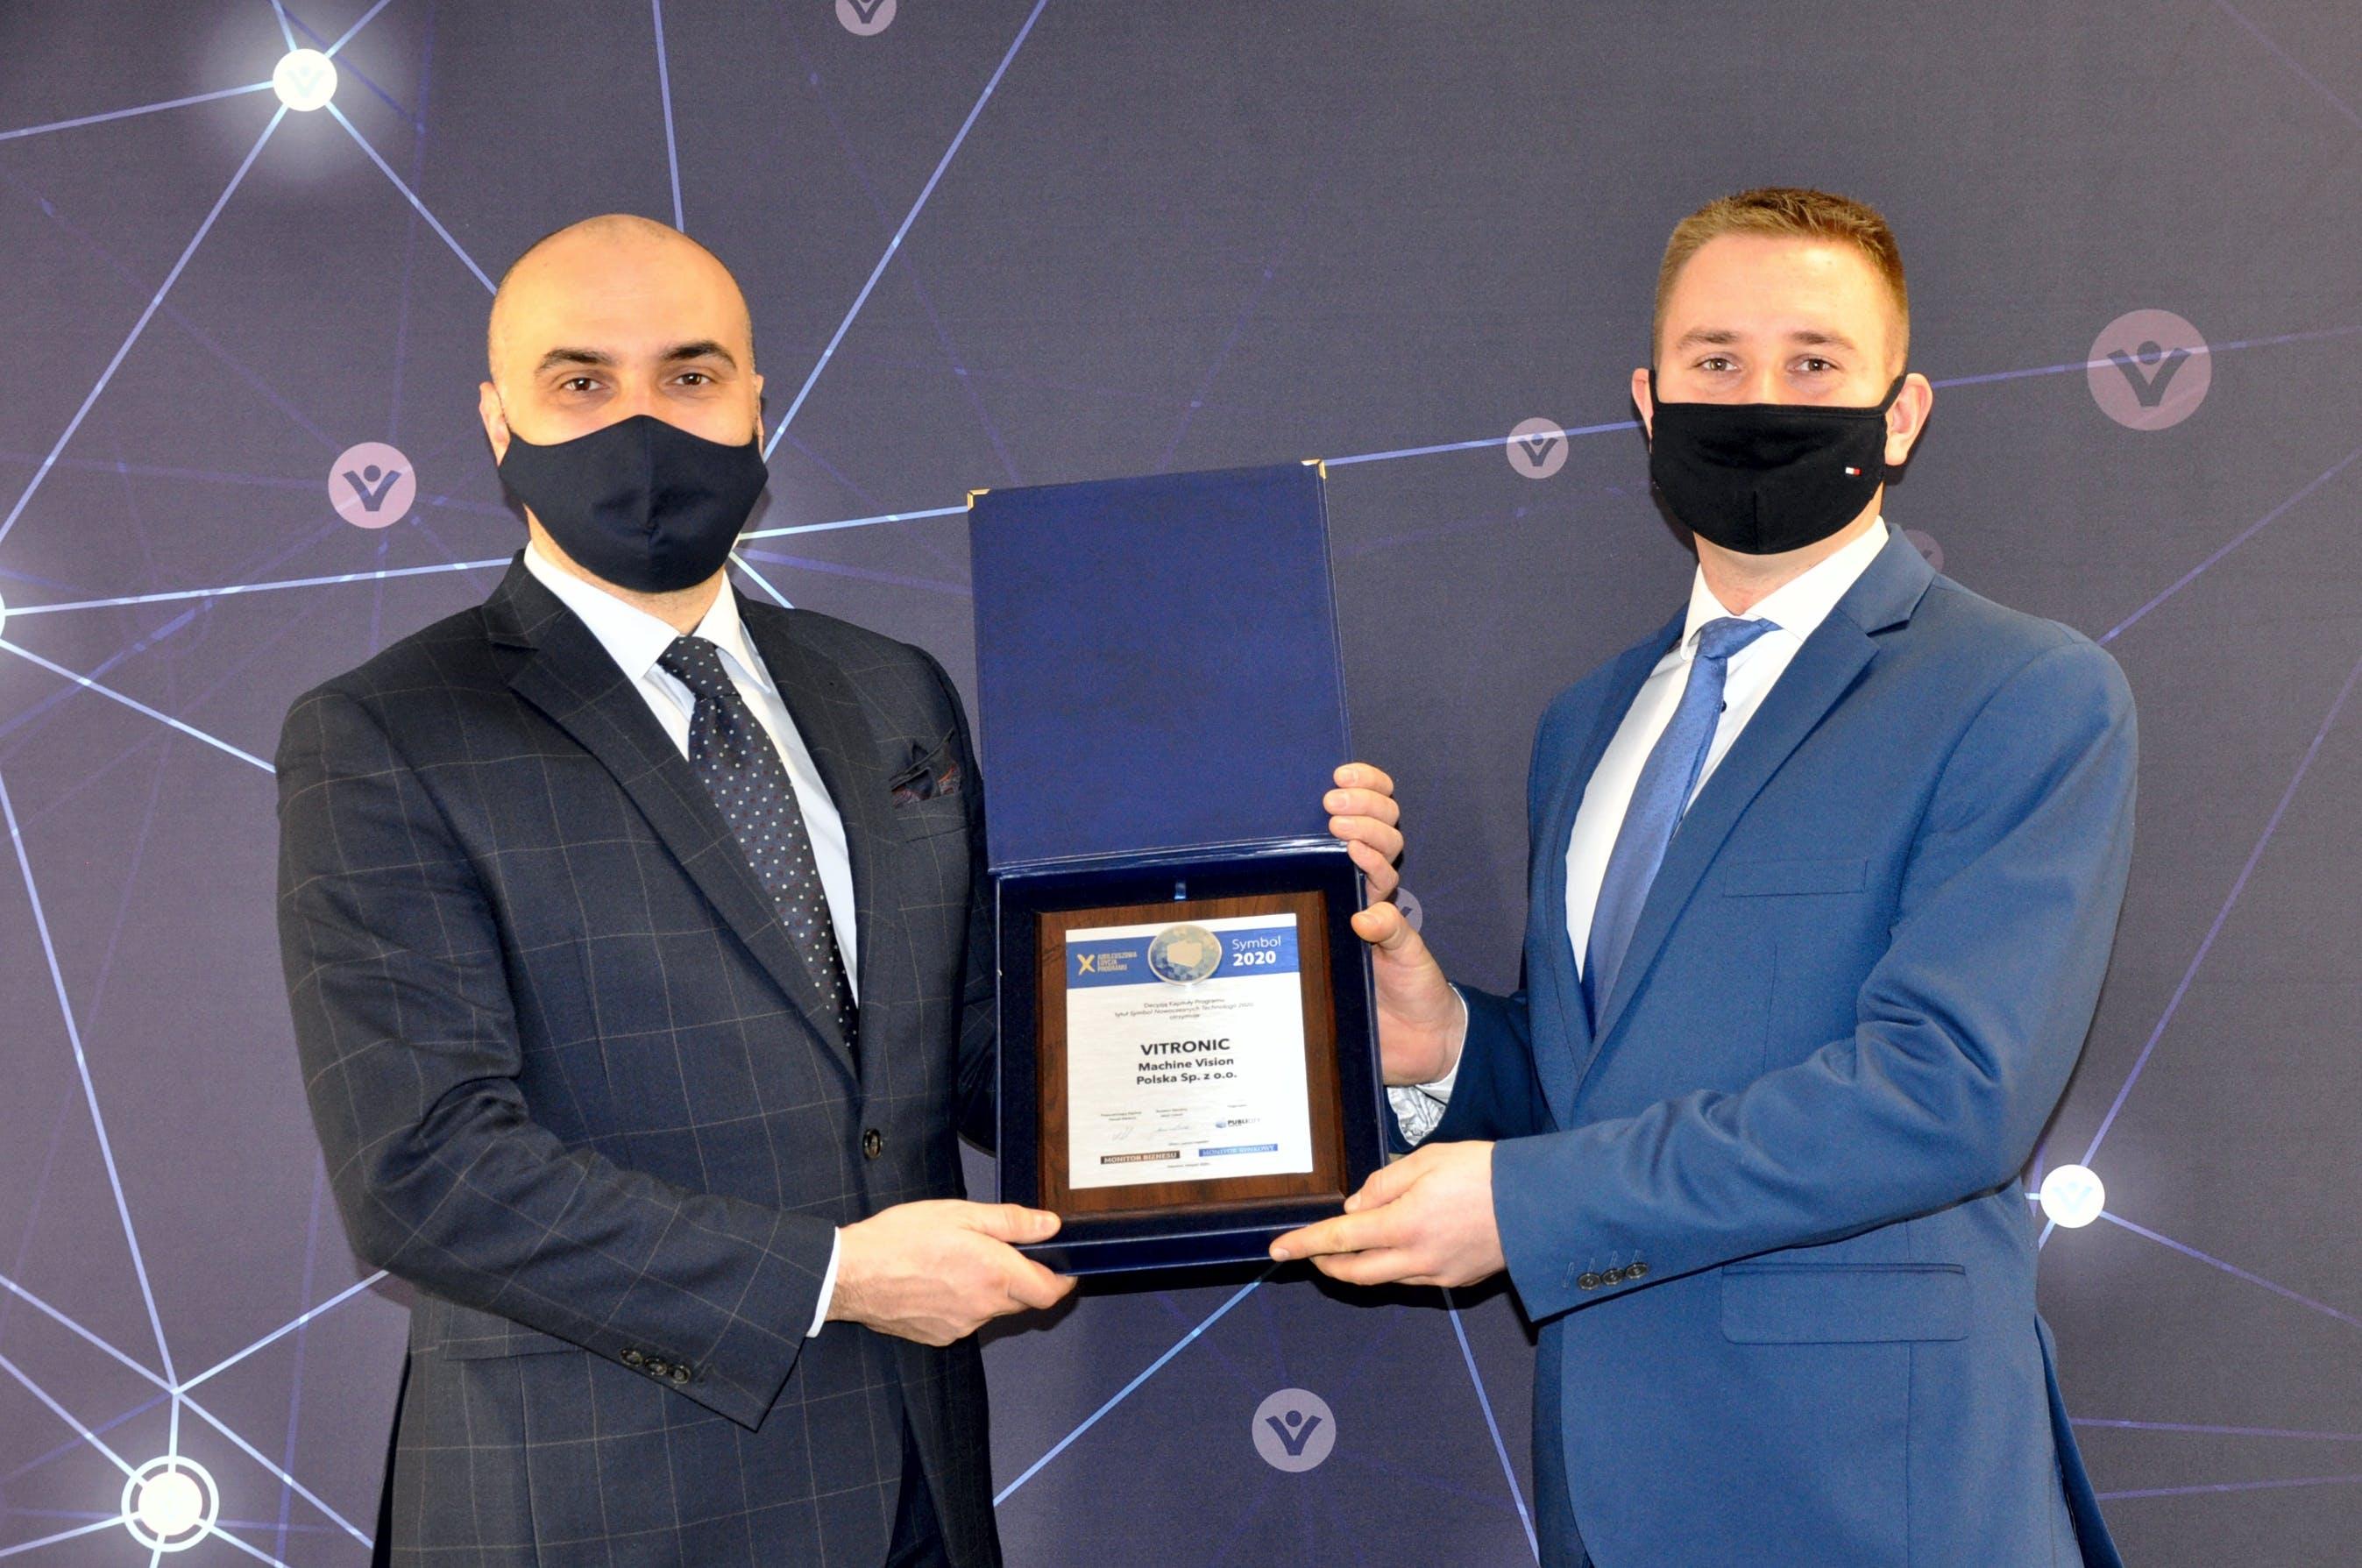 VITRONIC Machine Vision Polska erhält prestigeträchtigen Symbol Award